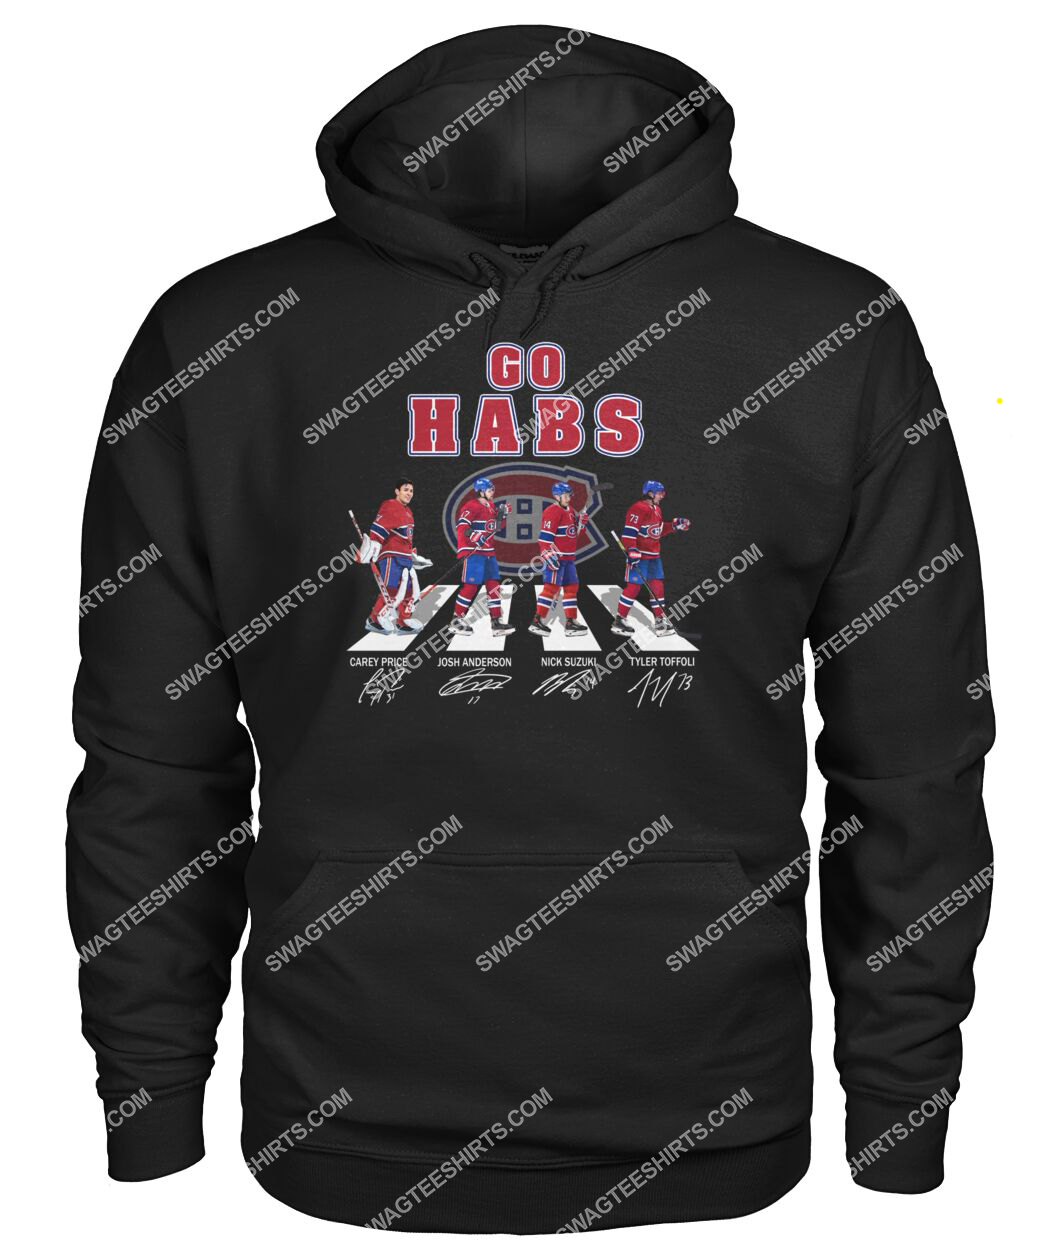 the montreal canadiens walking abbey road hoodie 1